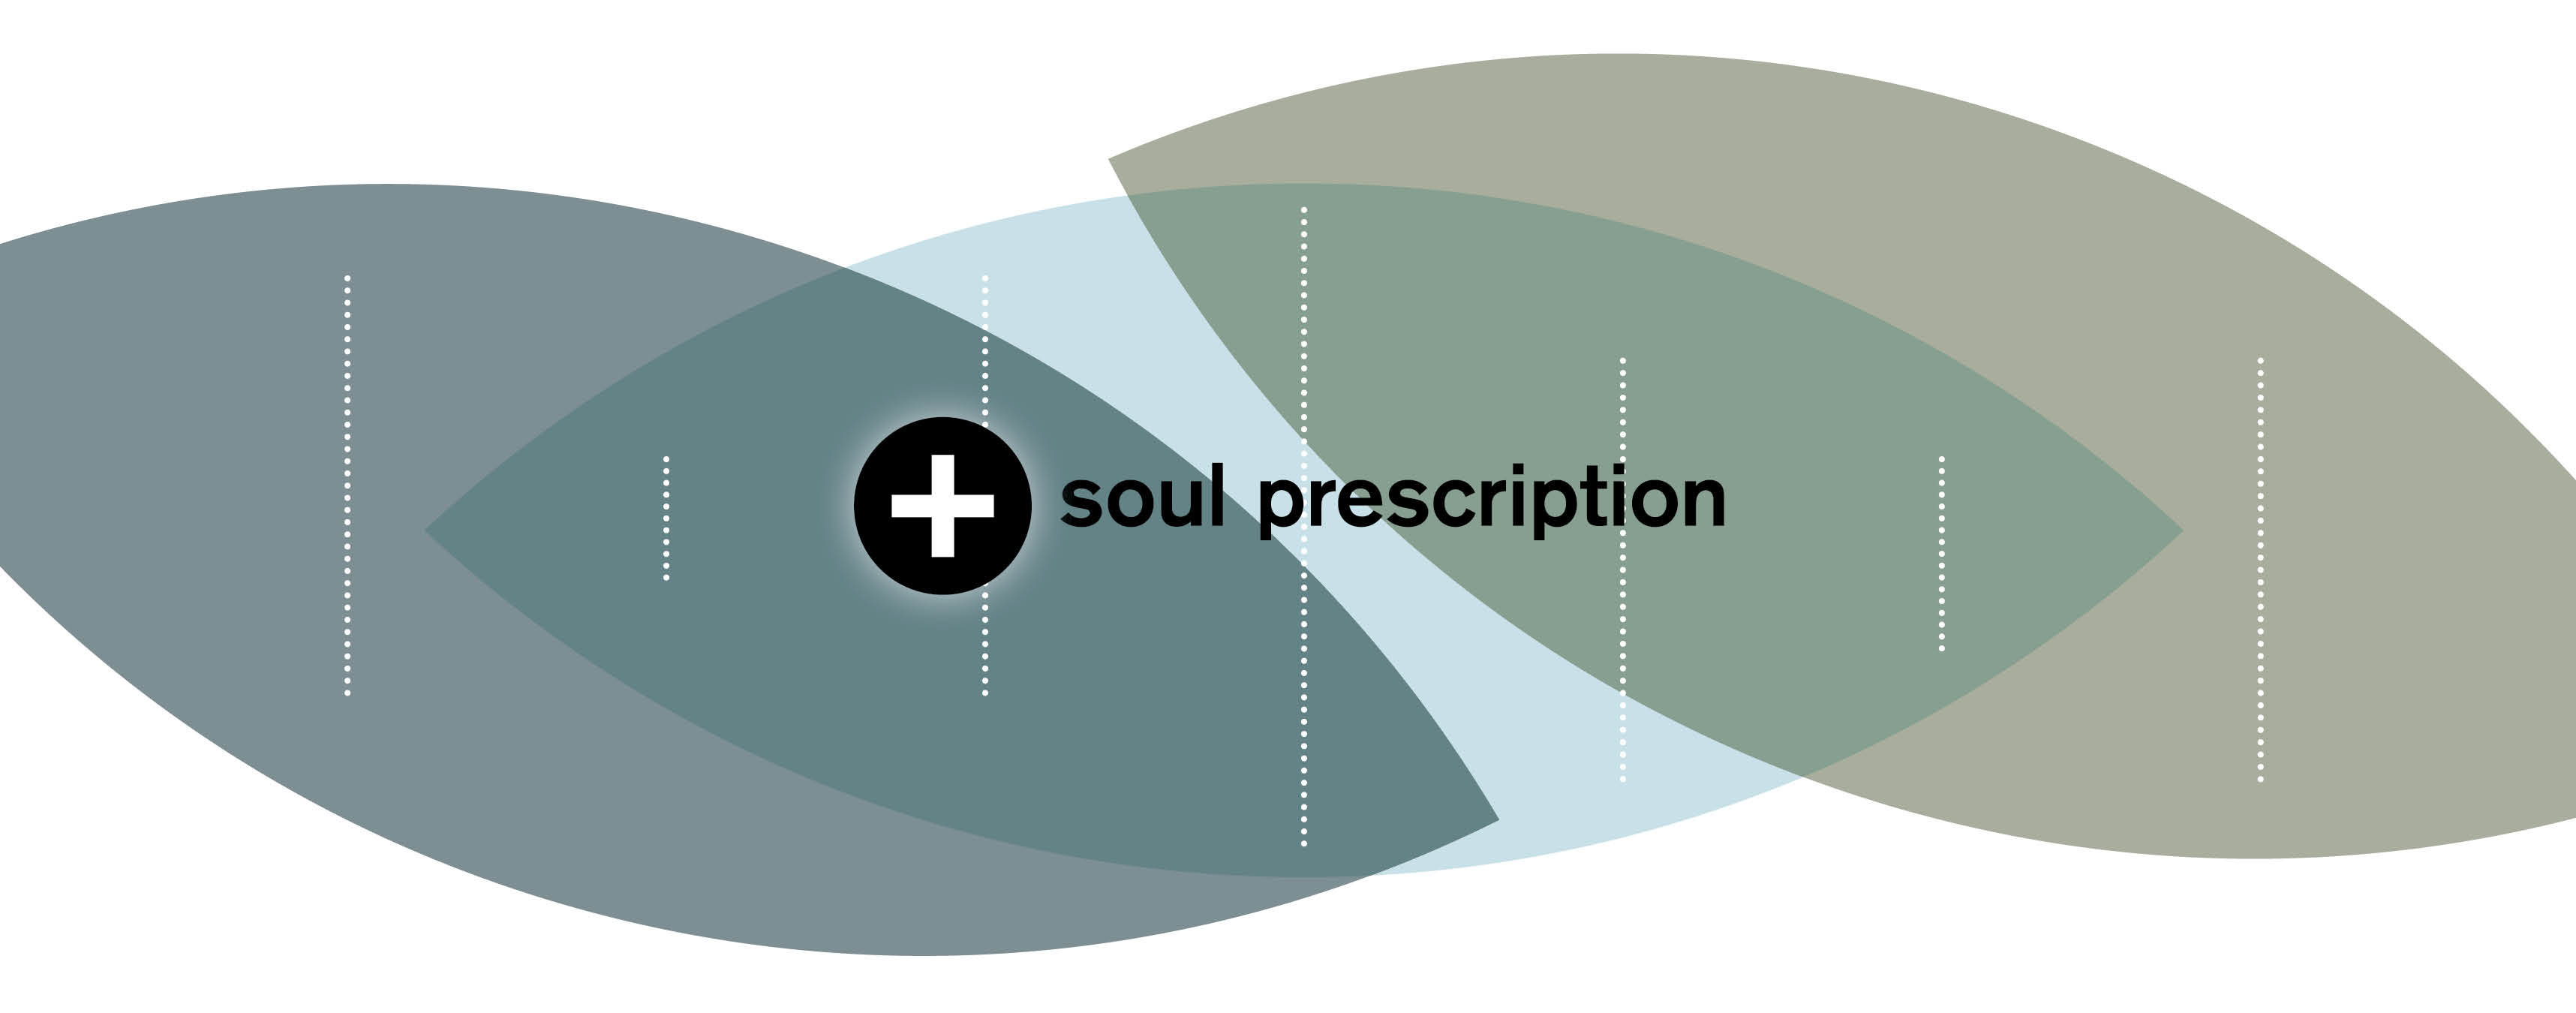 Soul Prescription November 2019 flyer